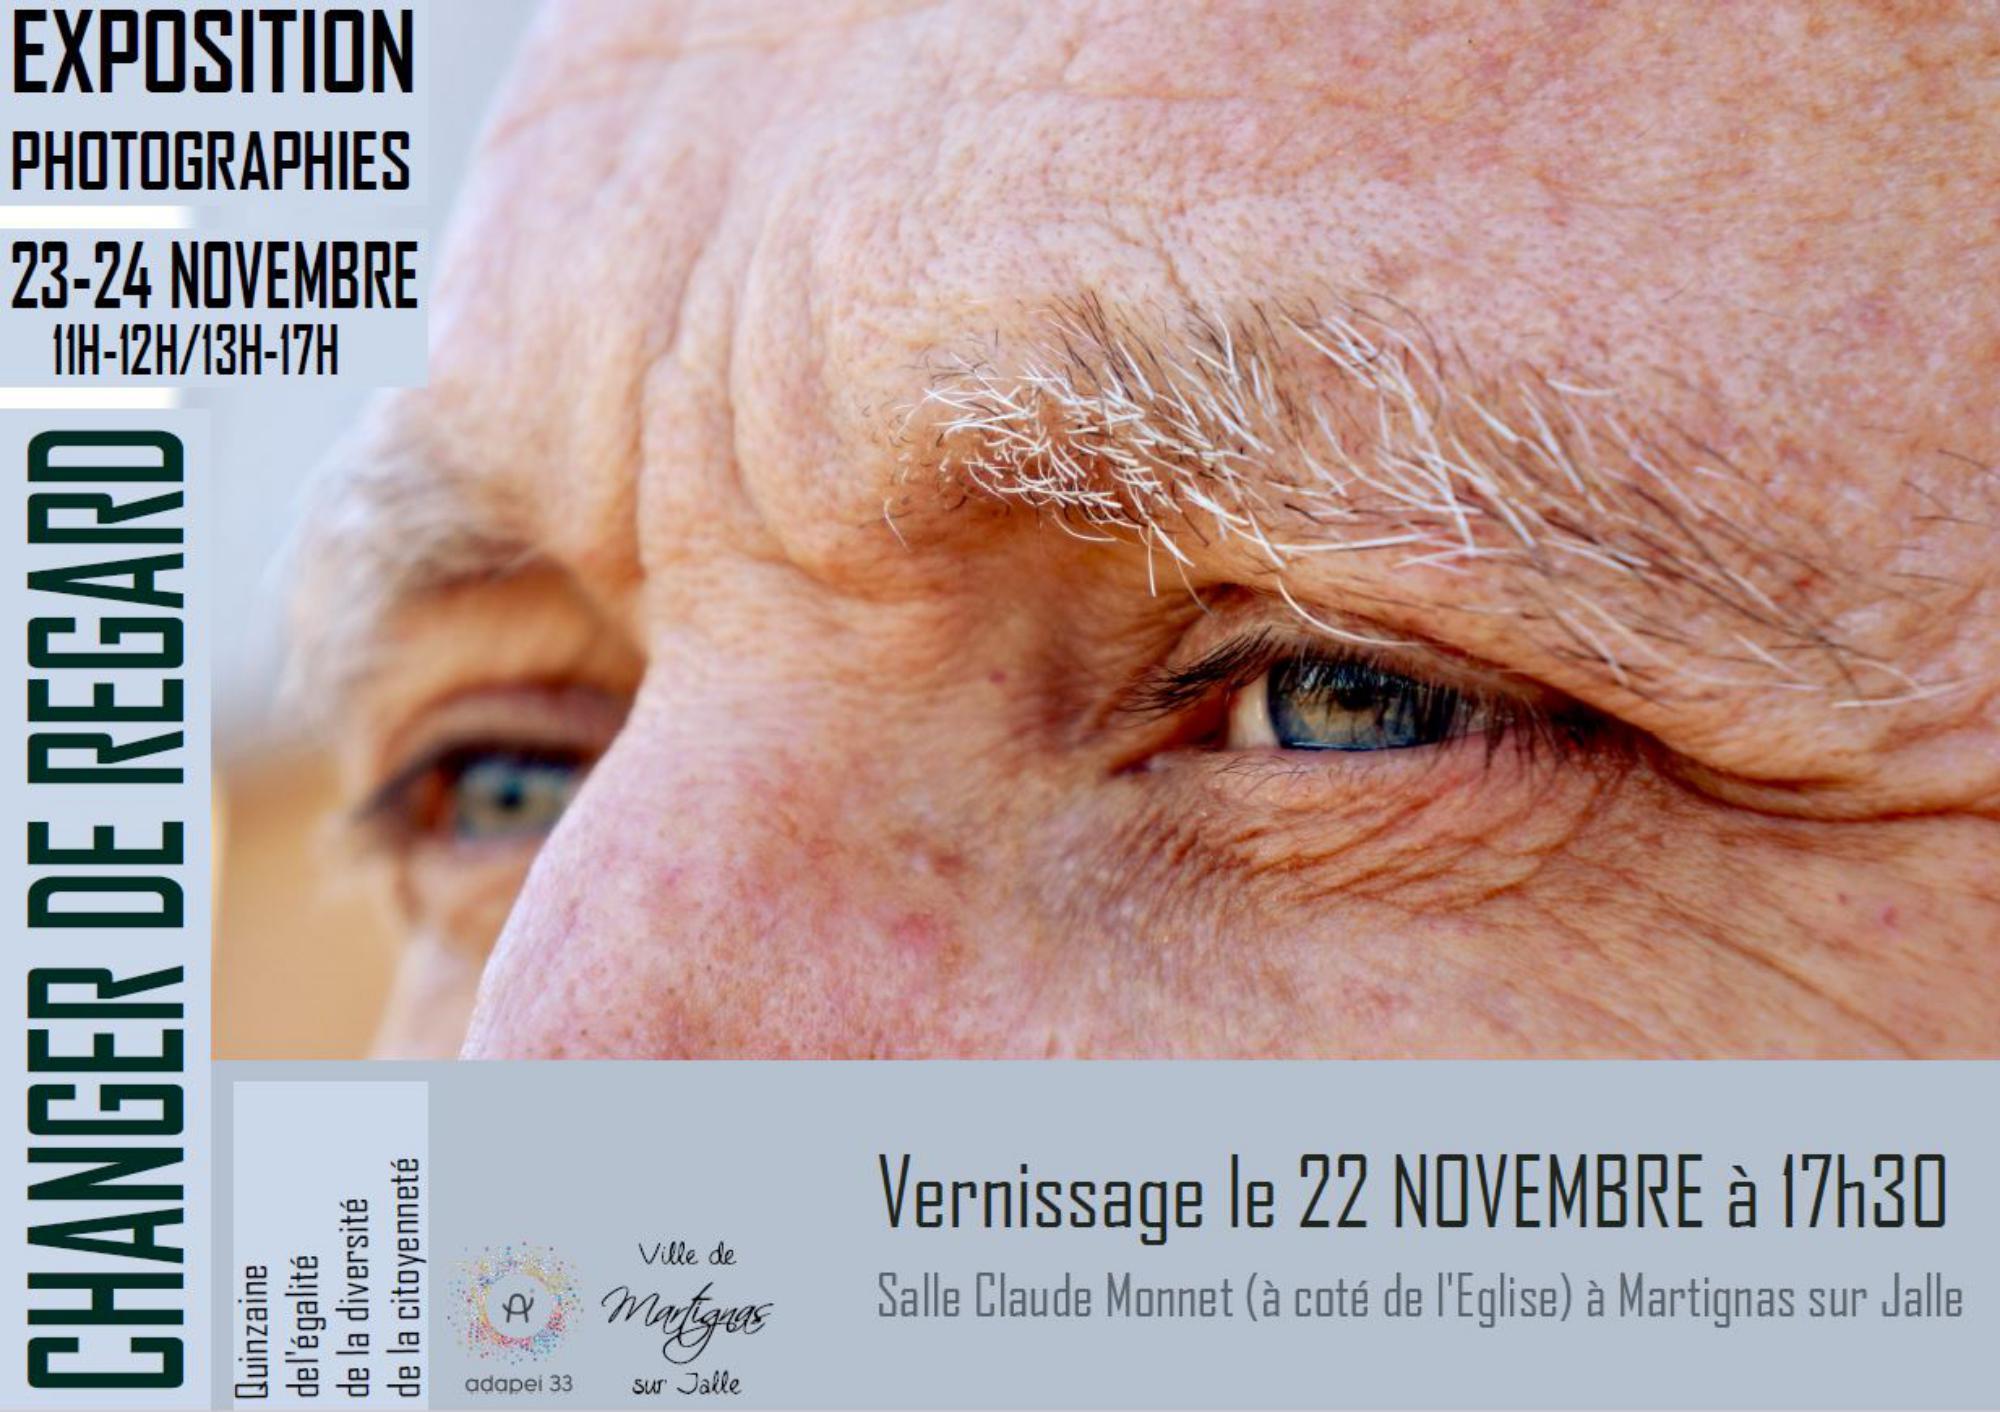 Exposition photographies  CHANGER DE REGARD